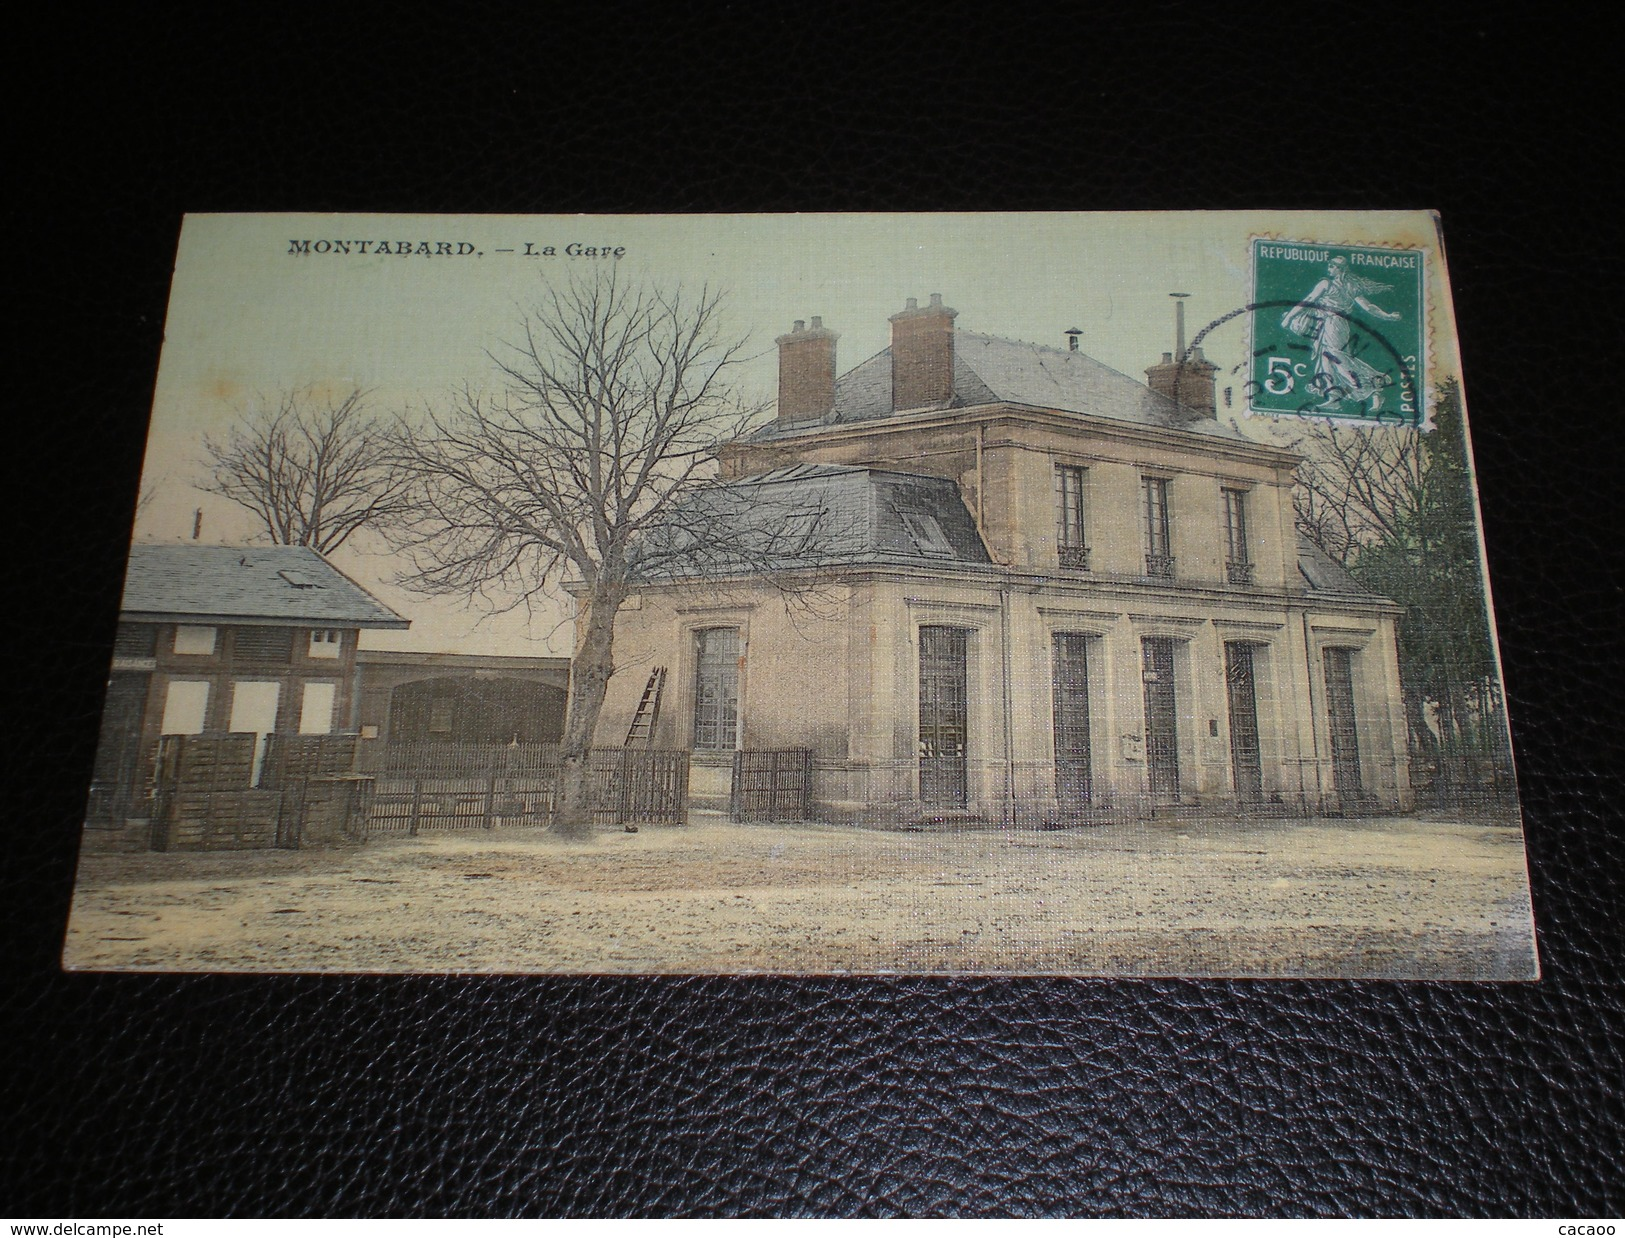 MONTABARD . La Gare. Année 1909 - France